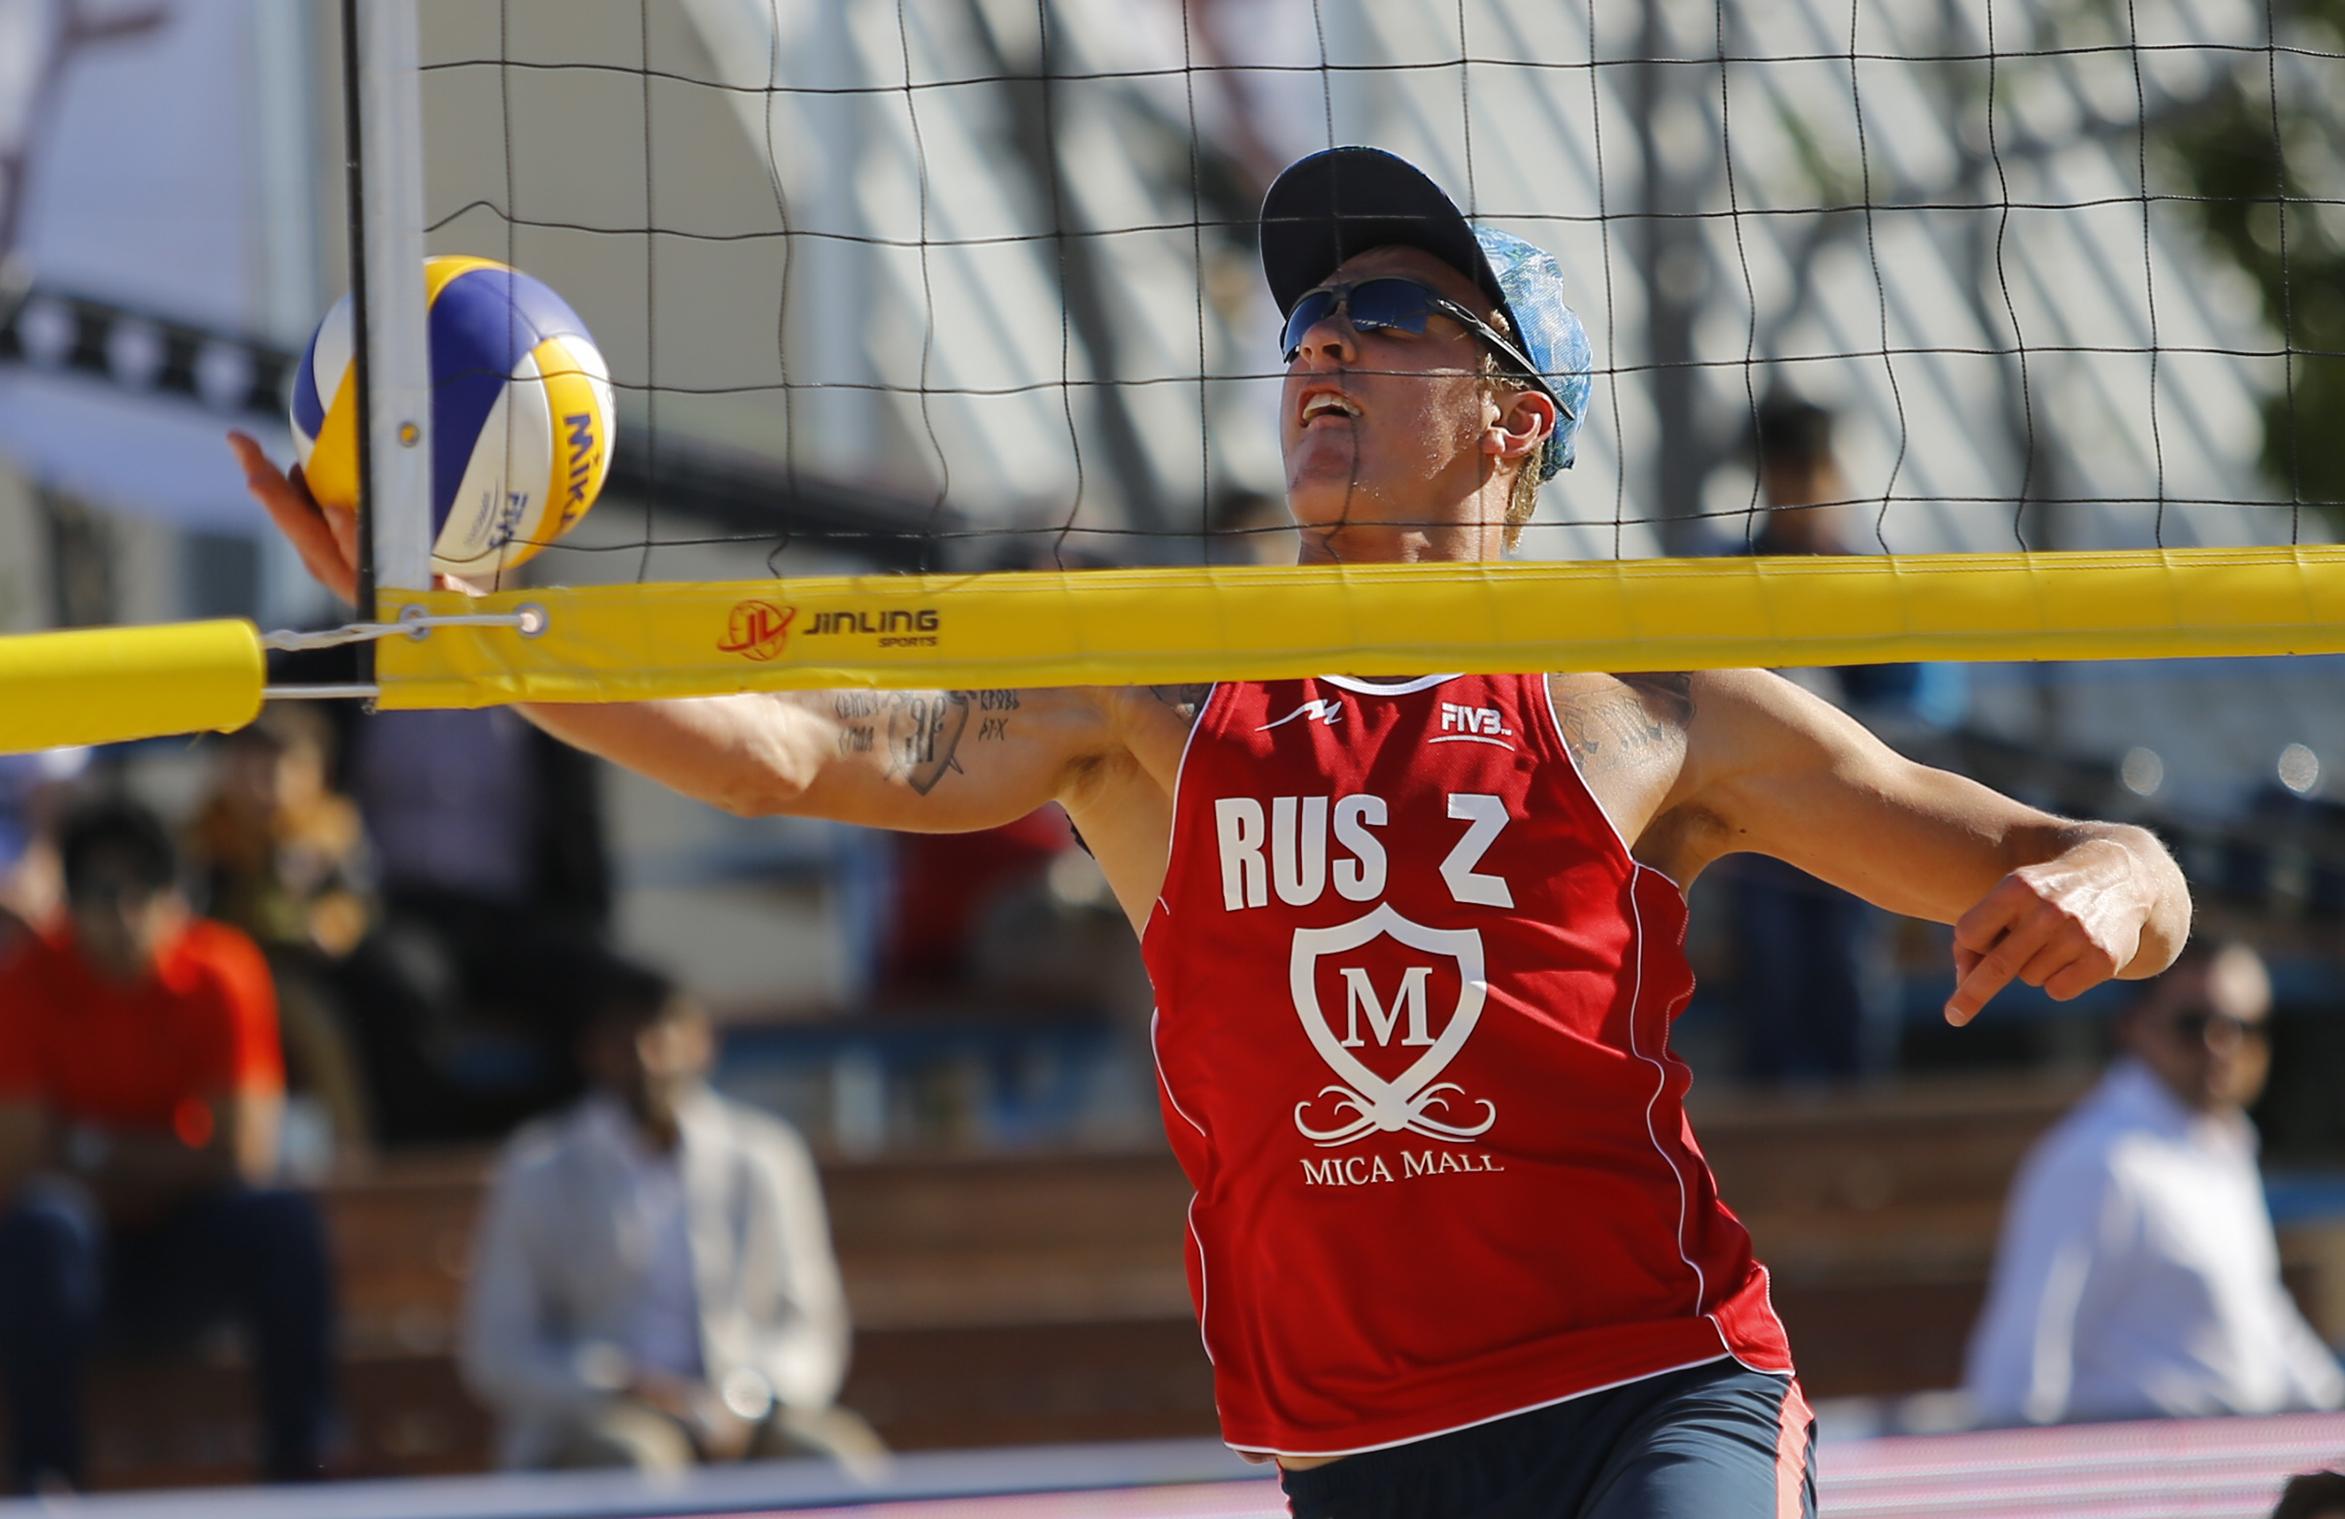 FIVB Beach Volleyball World Tour Kish Island 3-Star 2017